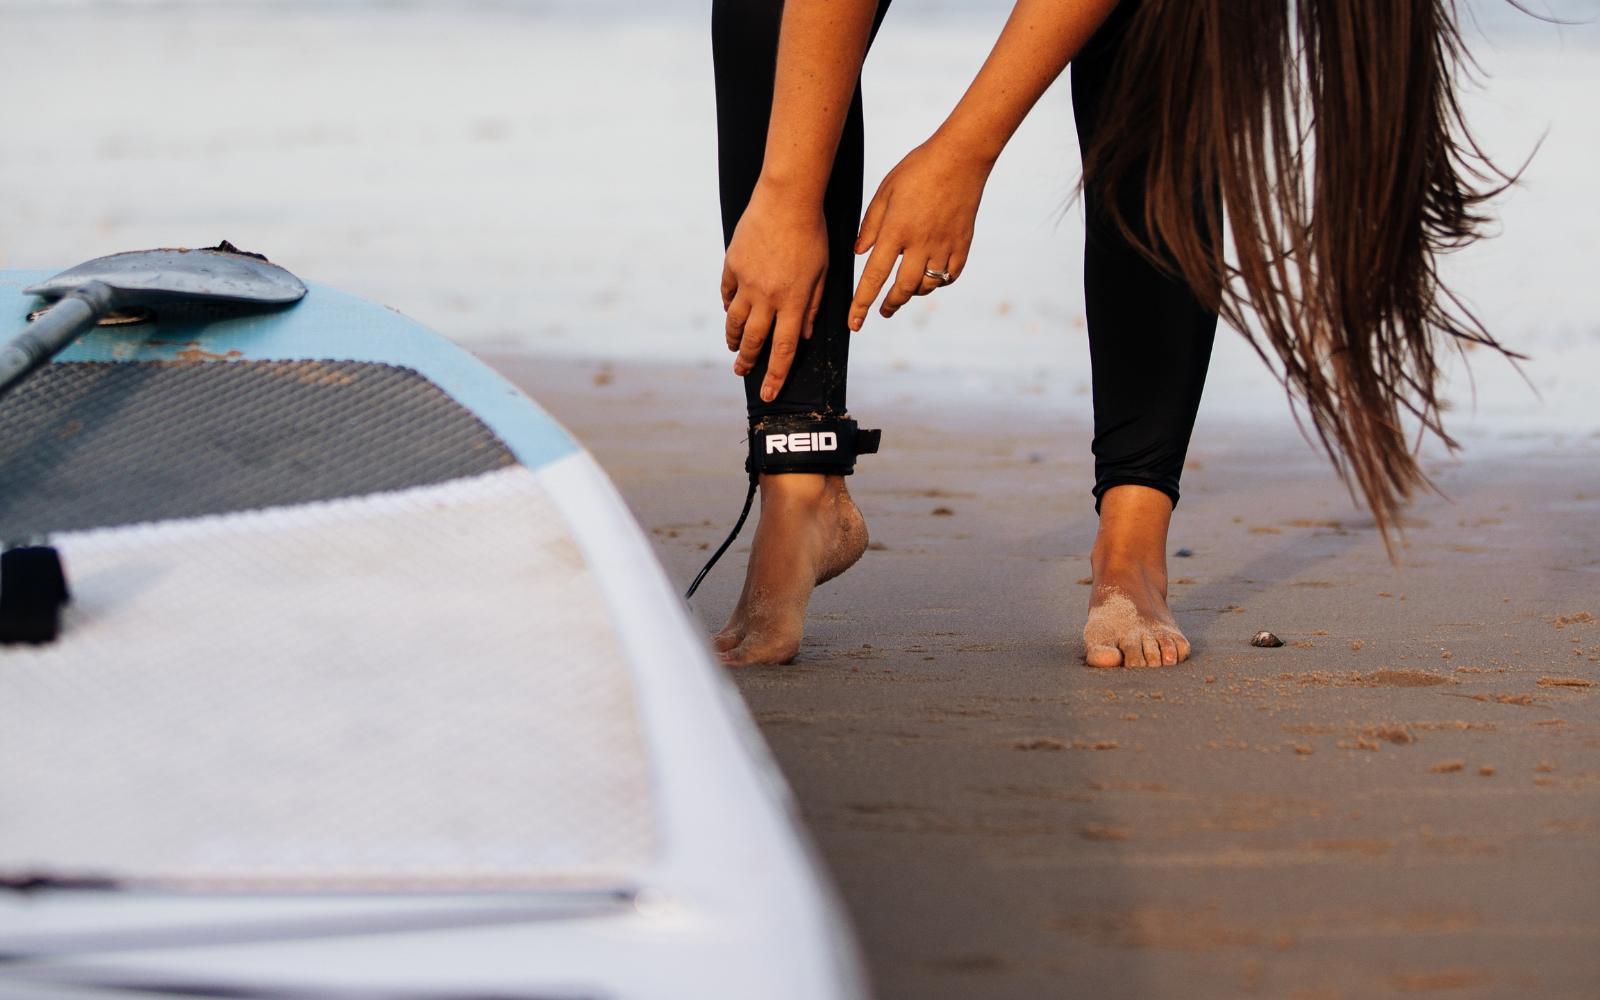 7 26 - Reid ® - Reid Santa Monica 10'6 Paddleboard